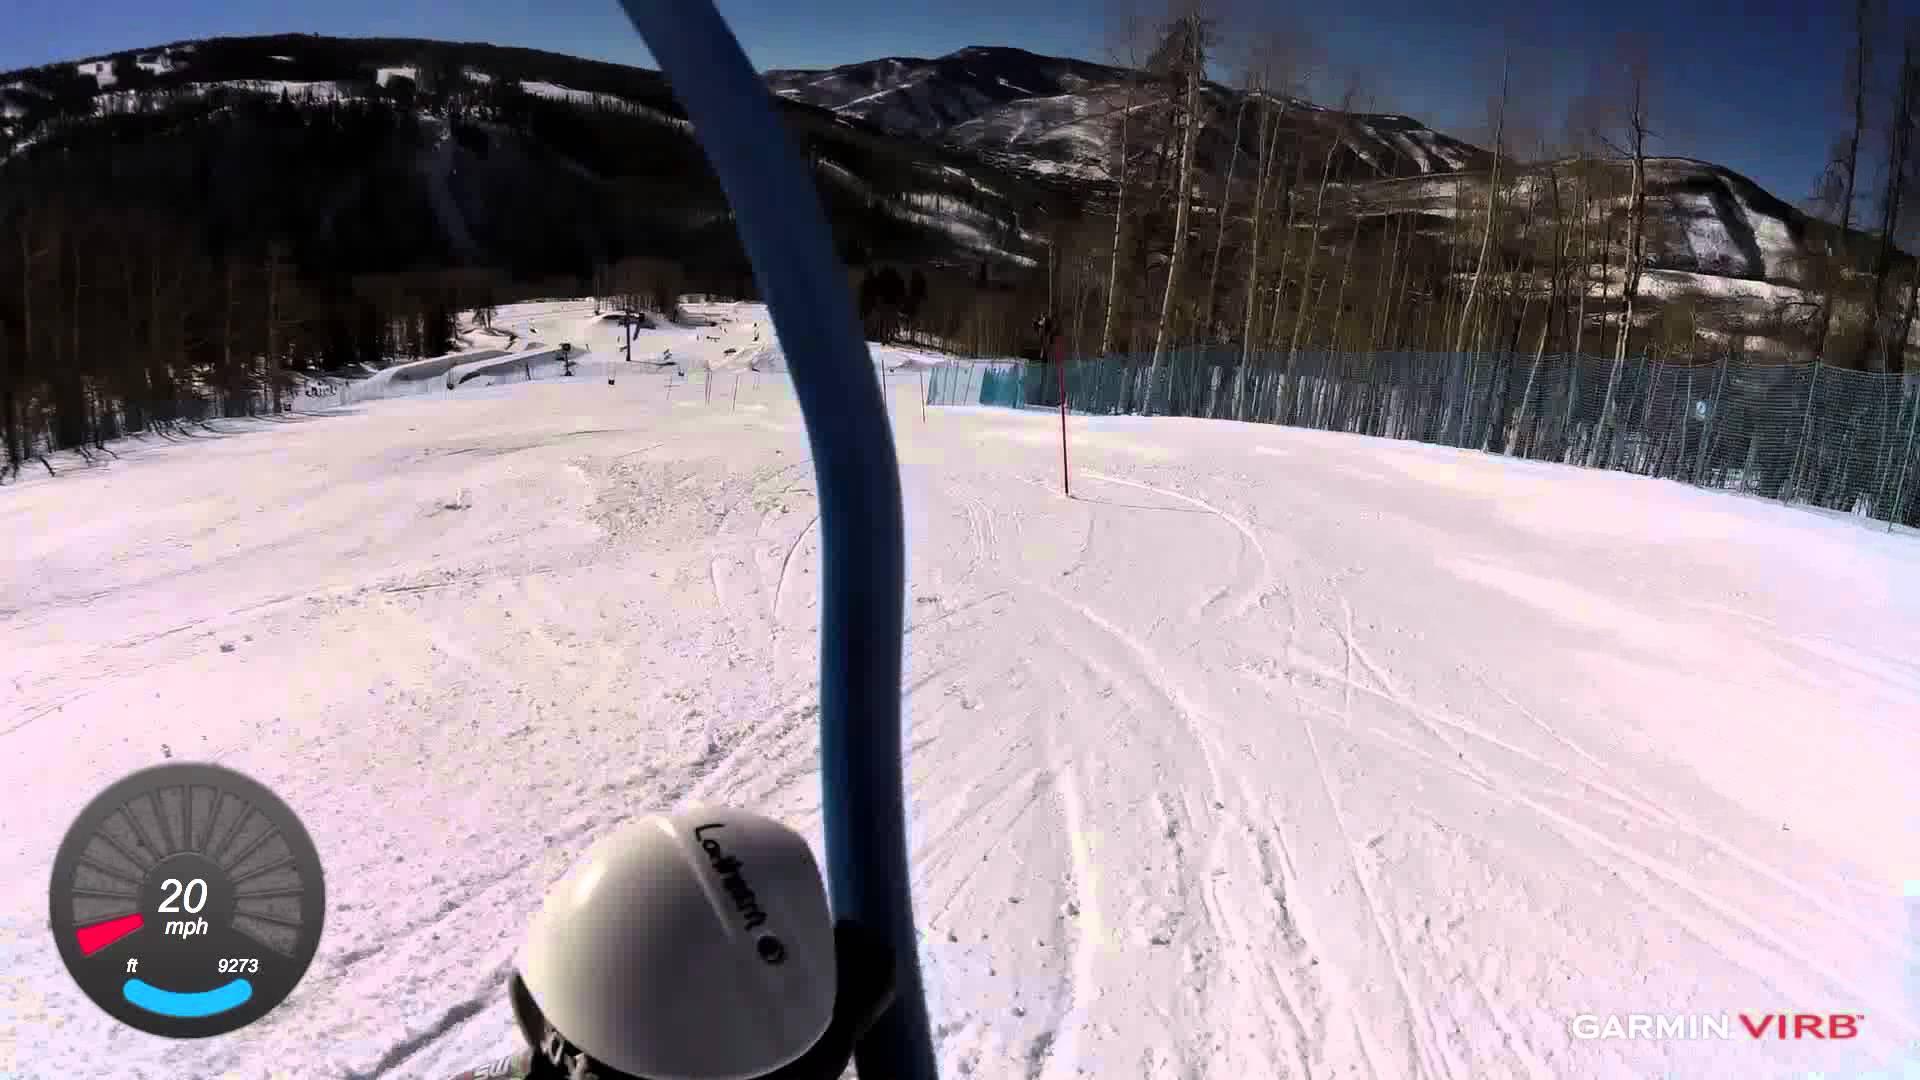 Garmin VIRB: Slalom Skiing